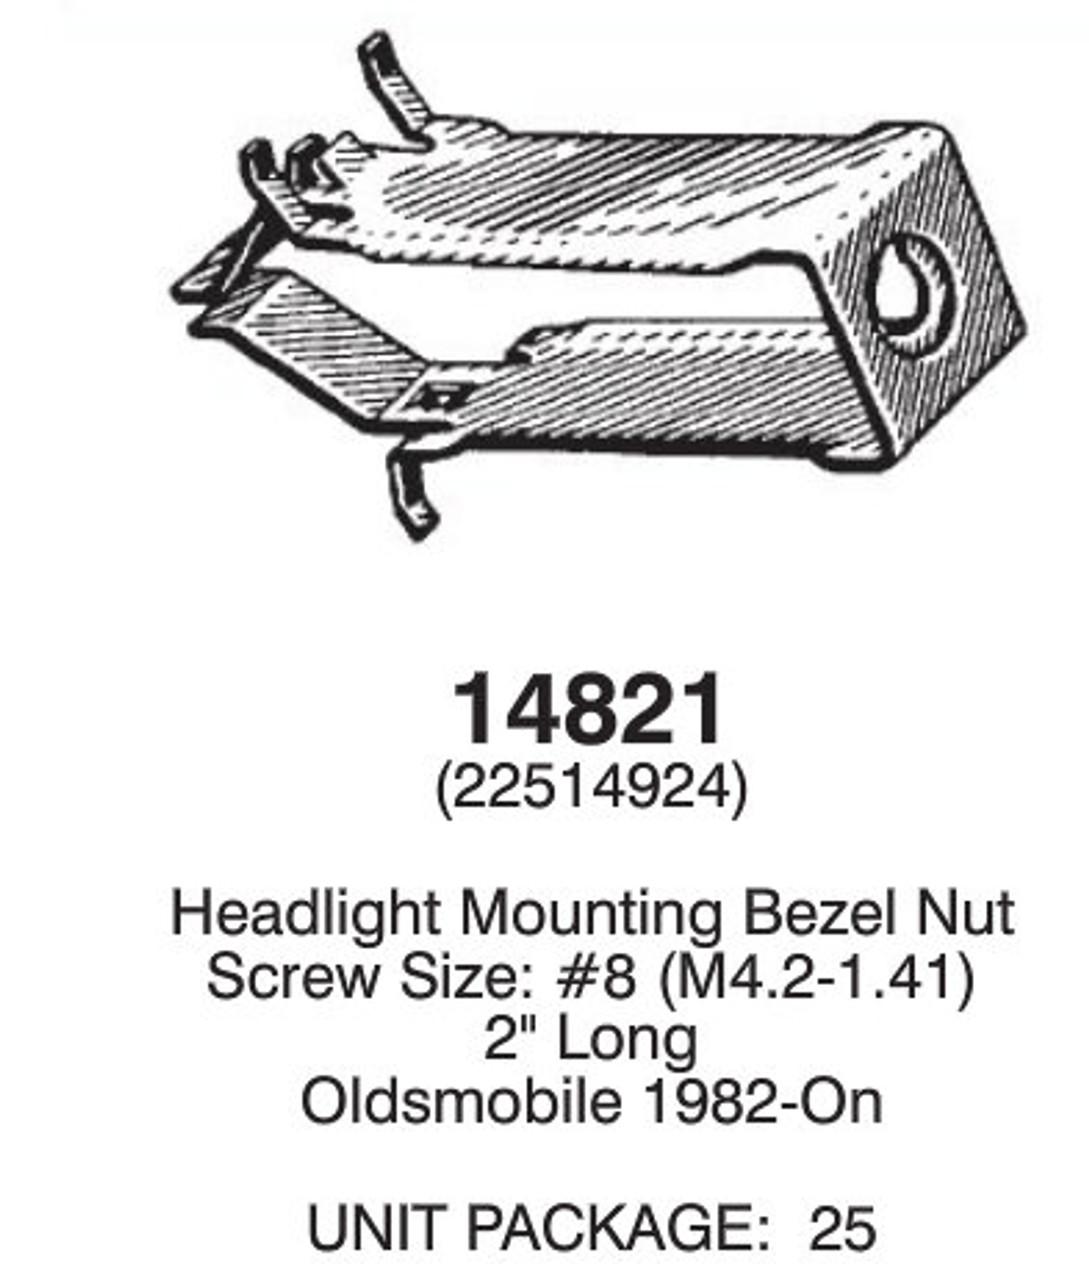 14821 Headlight Mounting Bezel Nut - Denver Auto Fasteners & Supply